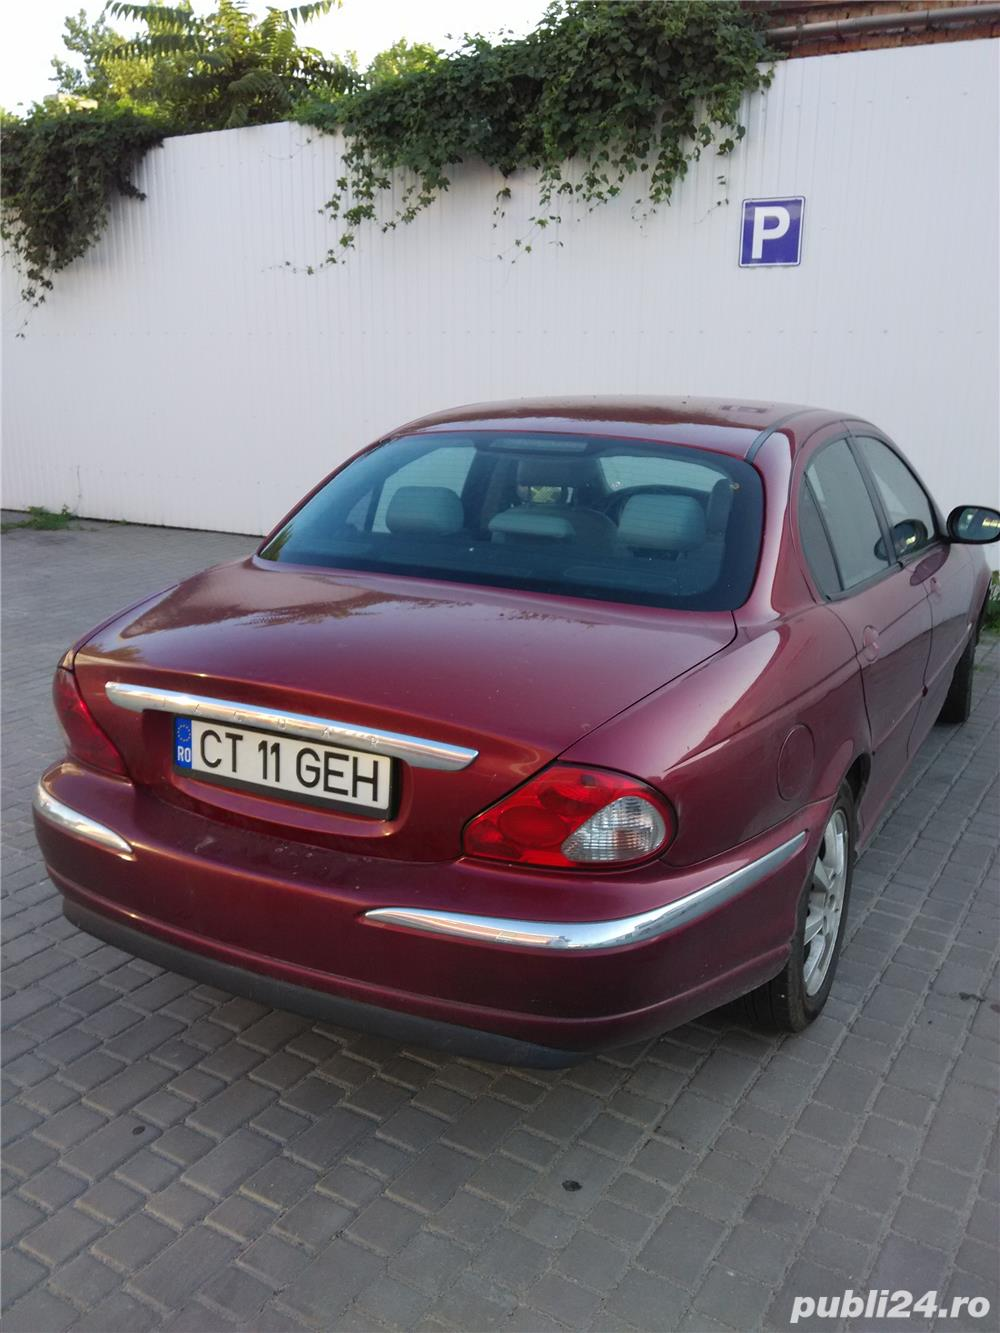 Jaguar x-type si in rate cu avans de 50% minim.